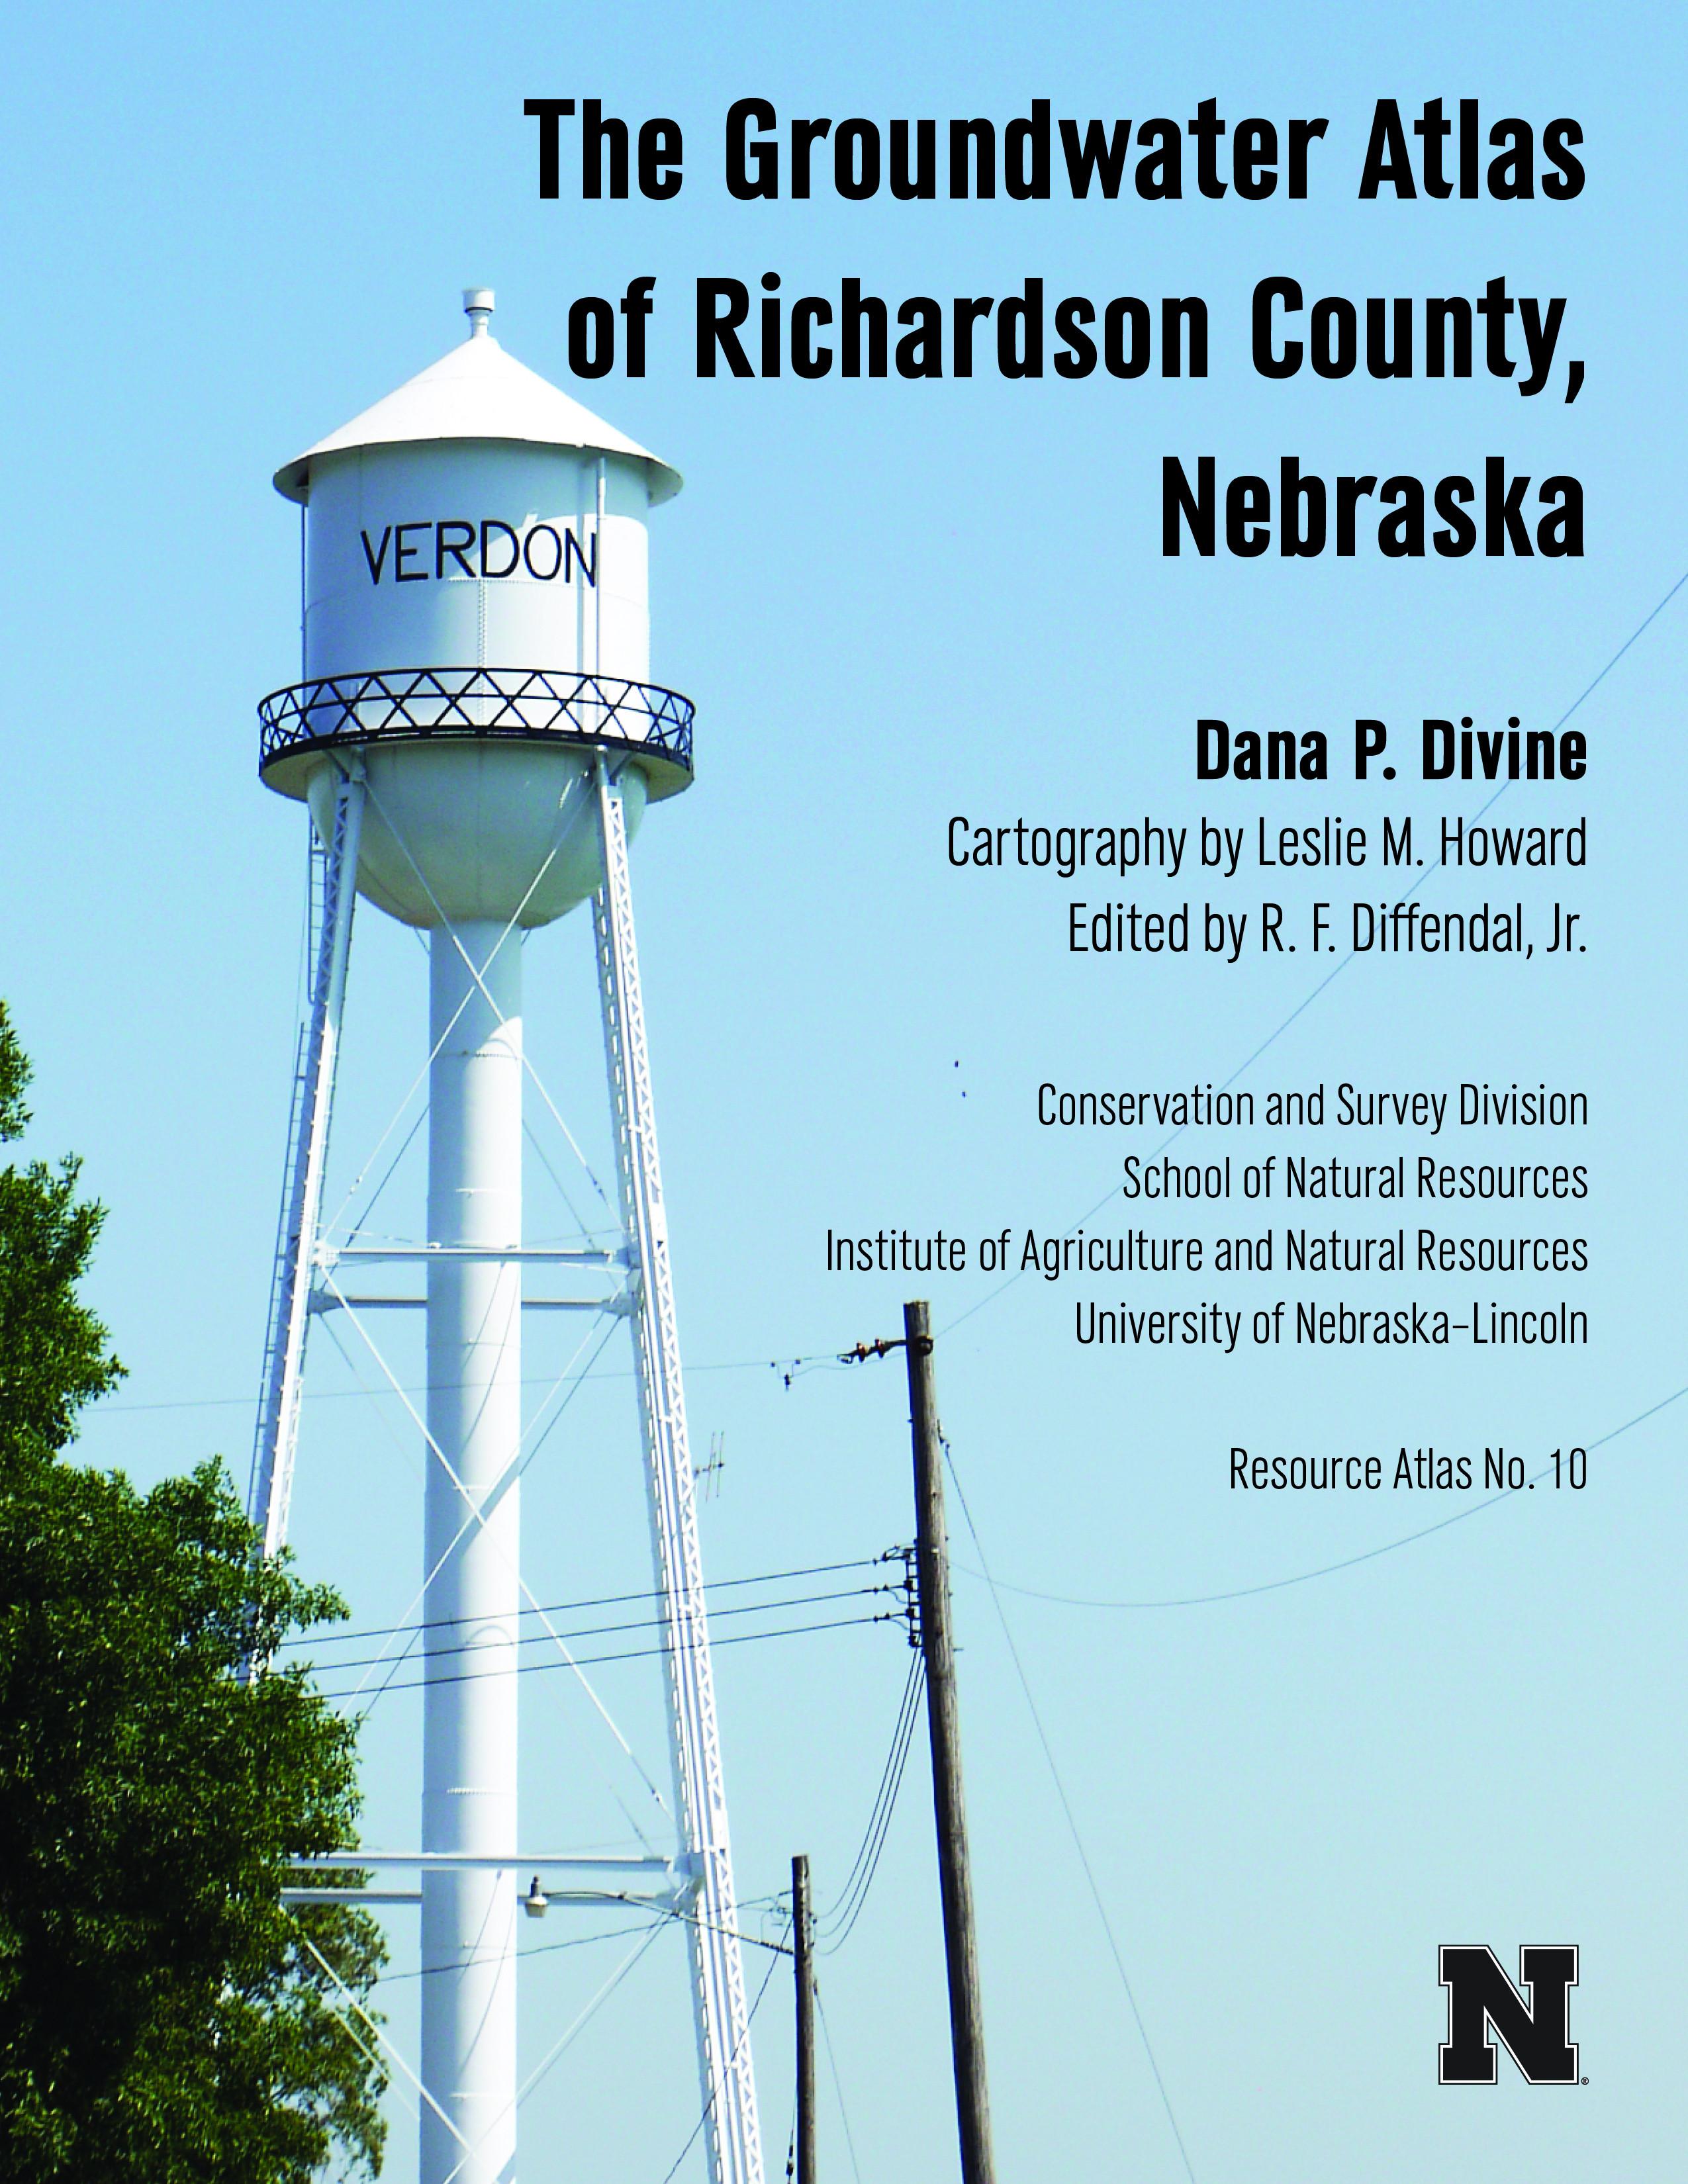 The Groundwater Atlas of Richardson County, Nebraska (RA-10)